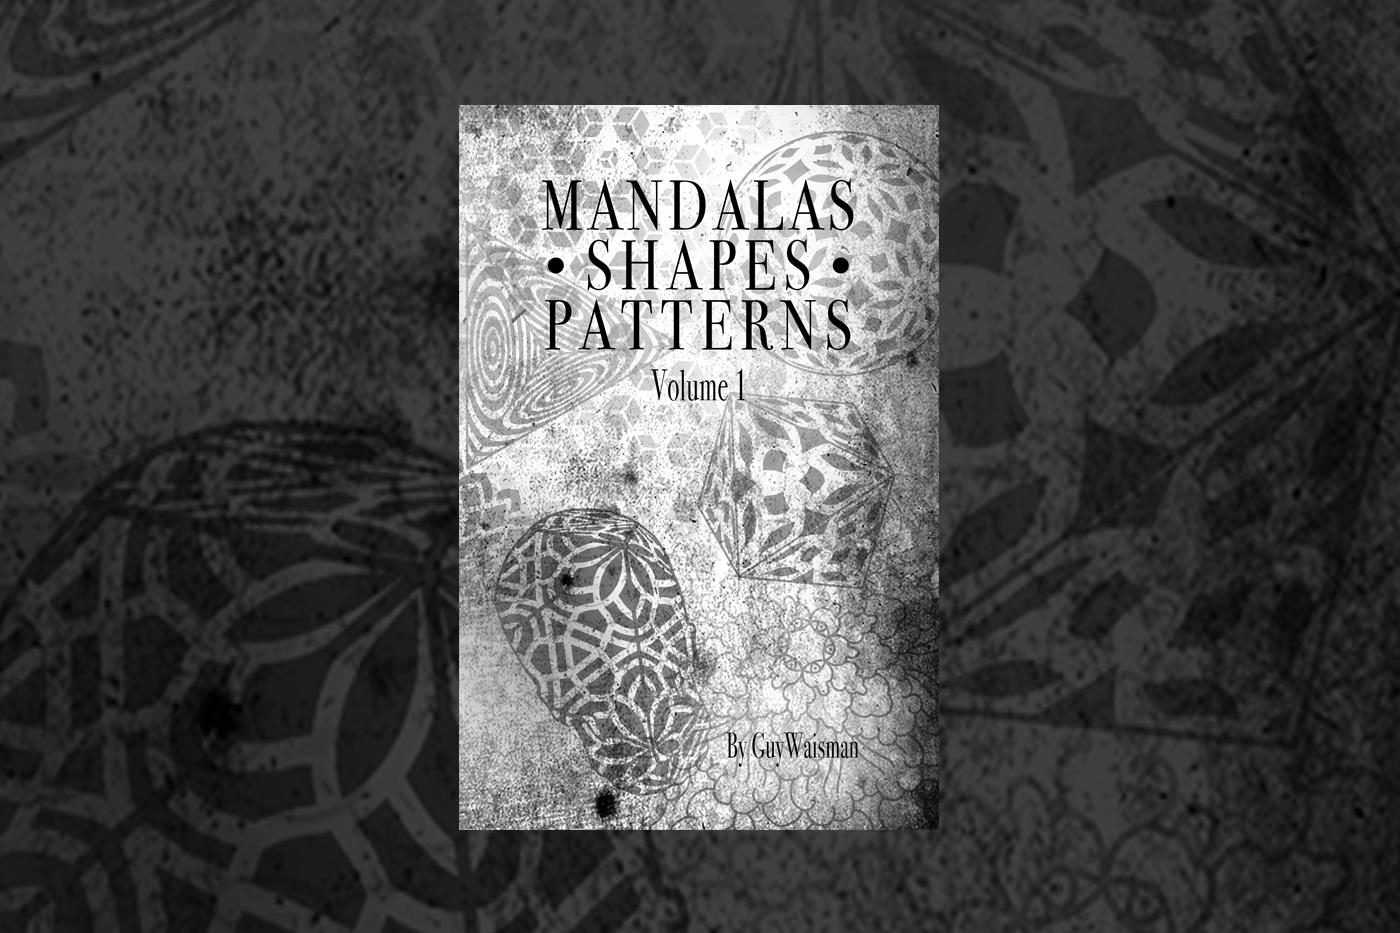 All_Books_for_website_mandalas-shapes_patterns.jpg